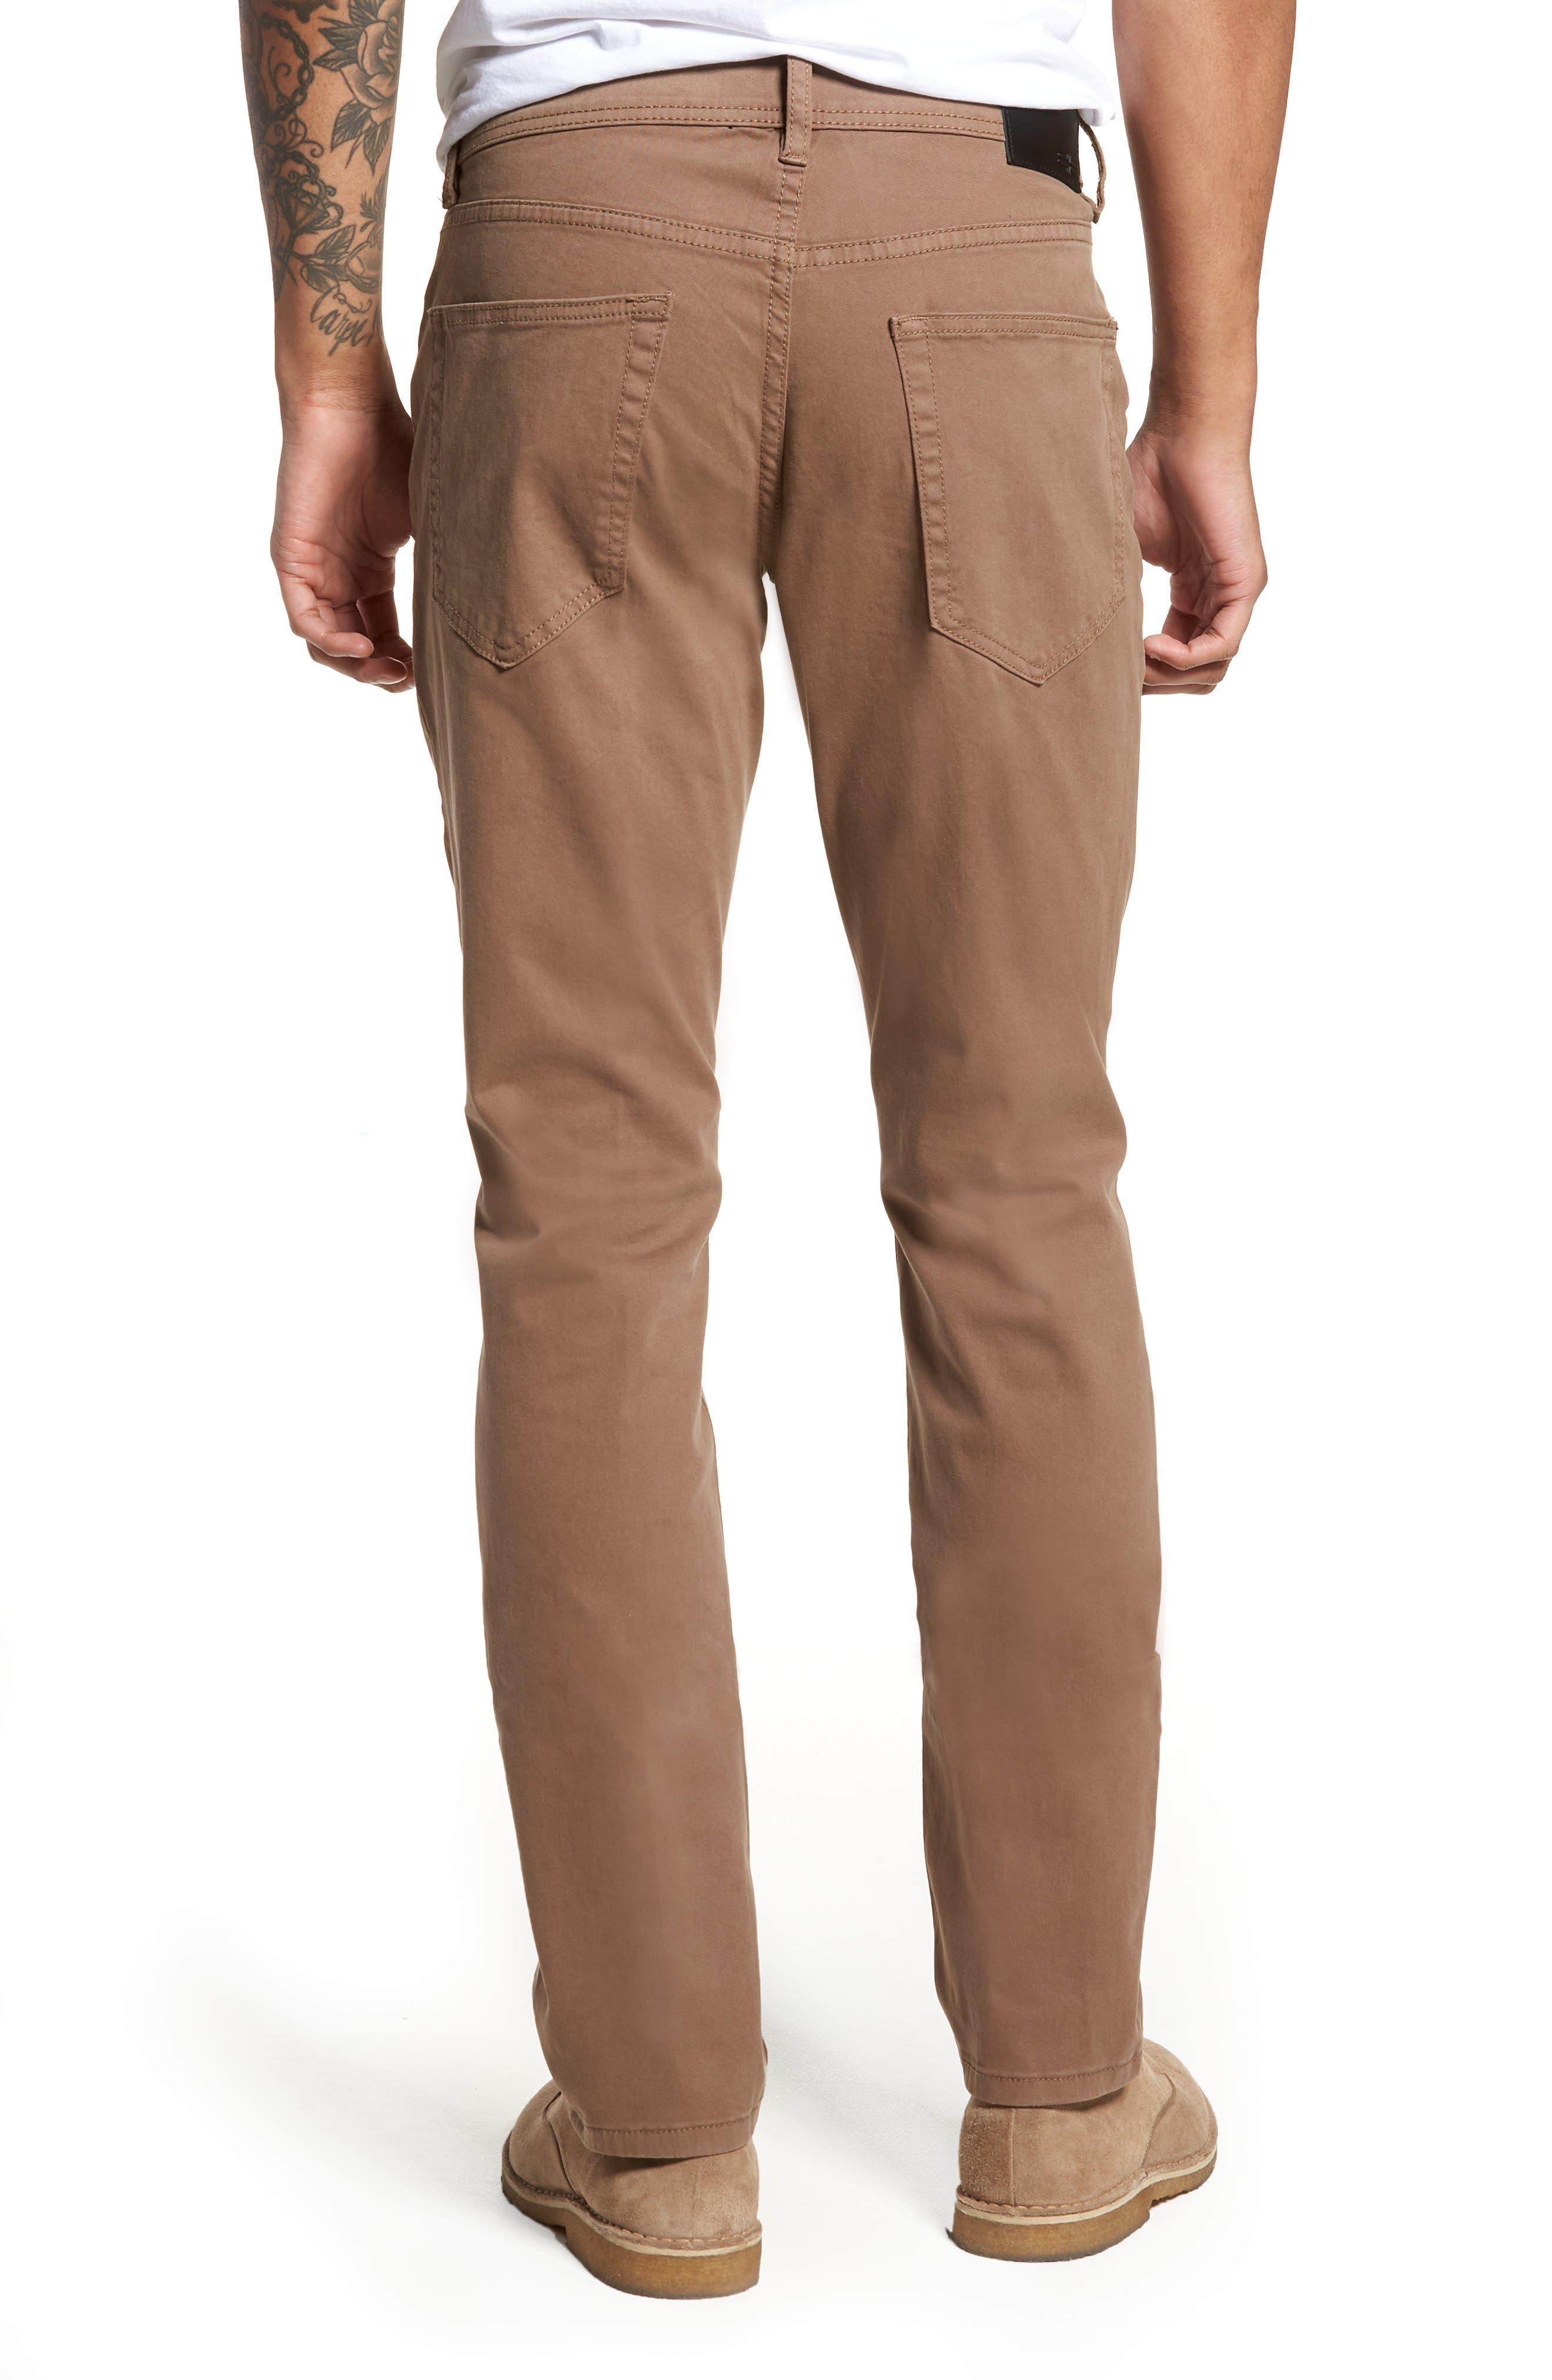 Jeans Co. Slim Straight Leg Jeans,                             Alternate thumbnail 2, color,                             Cub